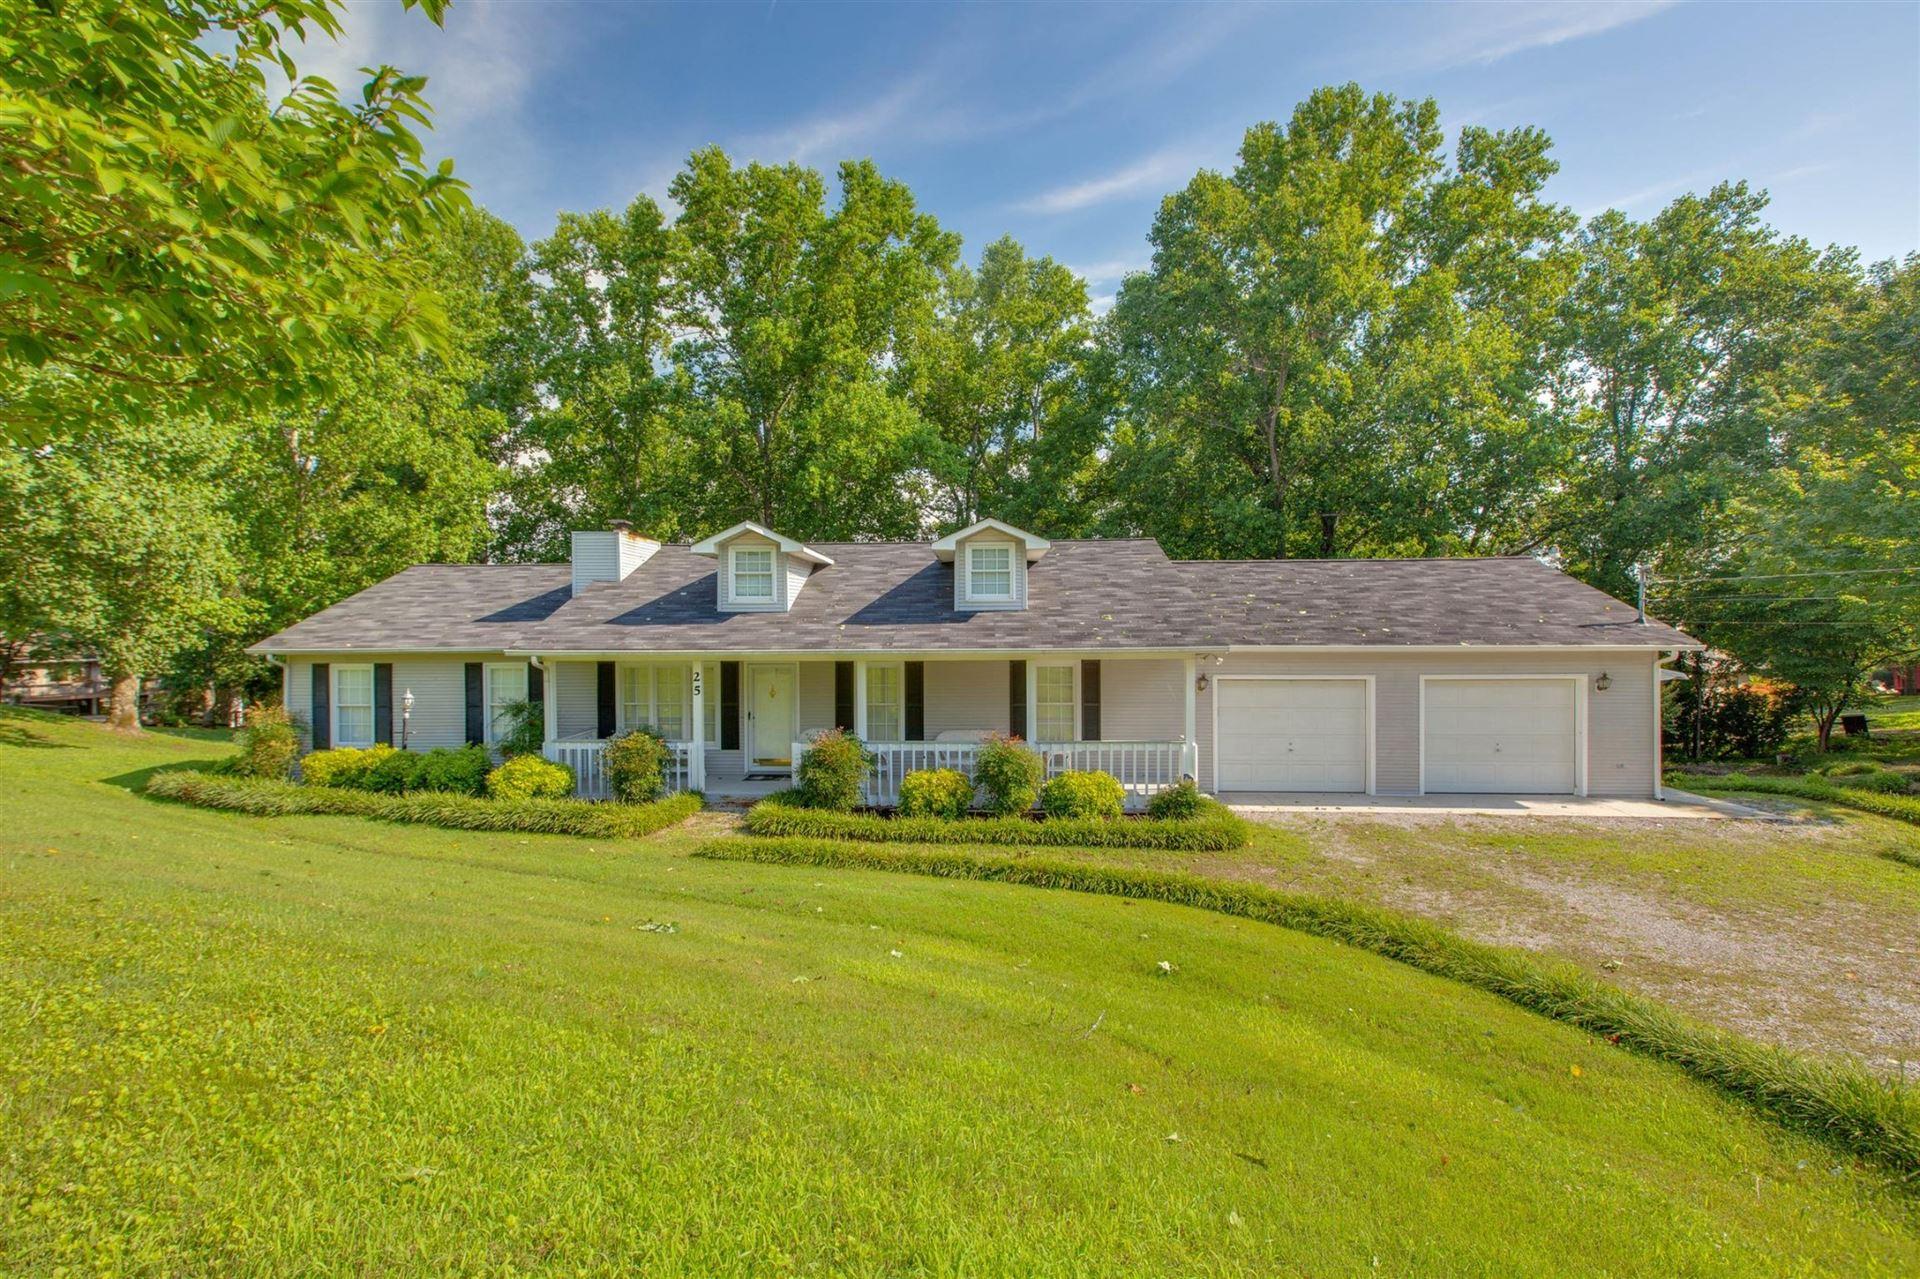 25 Cove Lake Cir, Winchester, TN 37398 - MLS#: 2144563